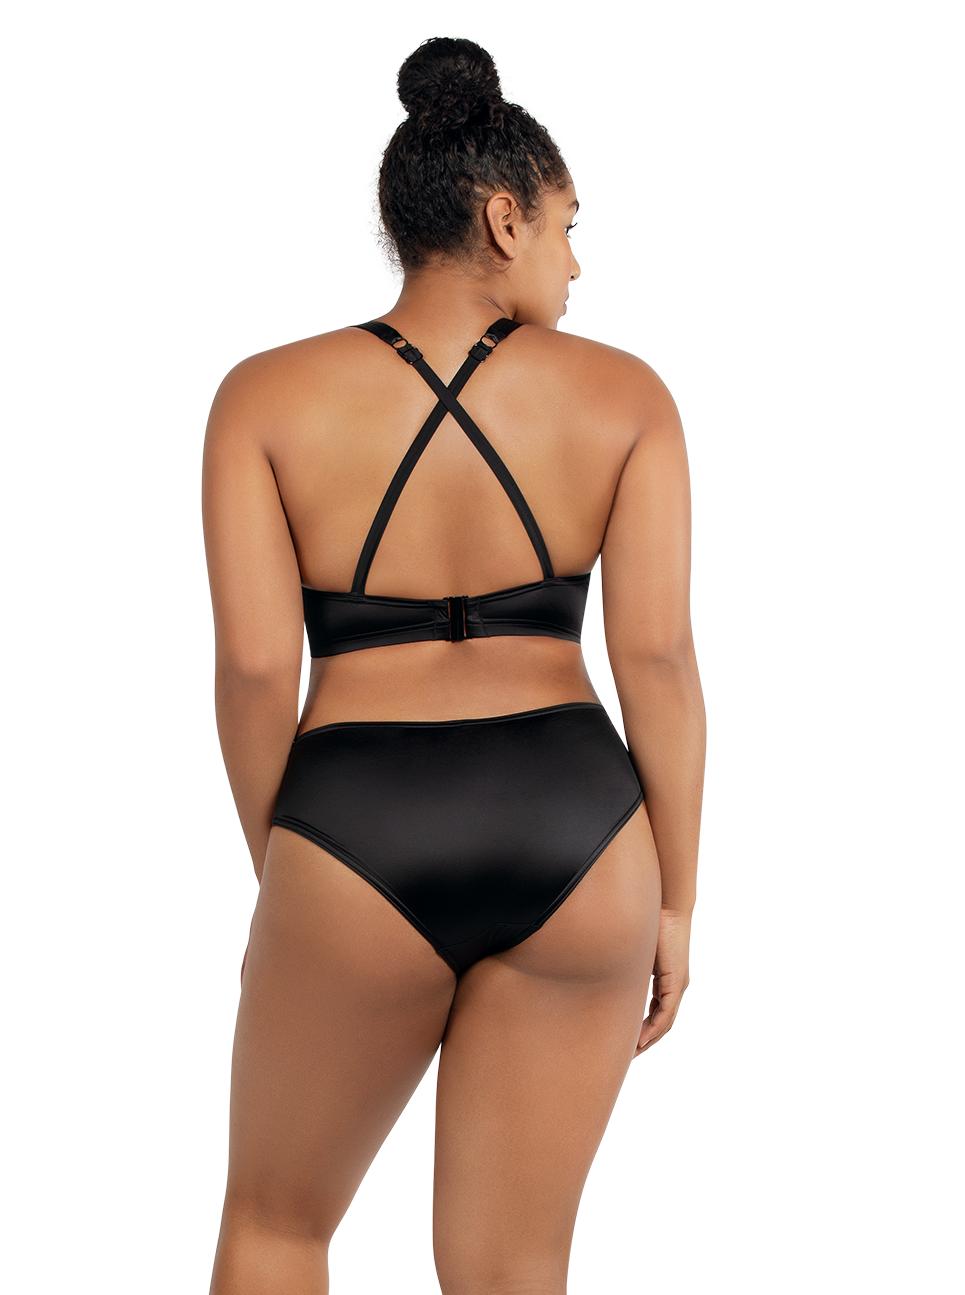 PARFAIT Rita LonglinePlungeTopS8142 BikiniBottomS8143 Black Back - Rita Bikini Bottom Black S8143